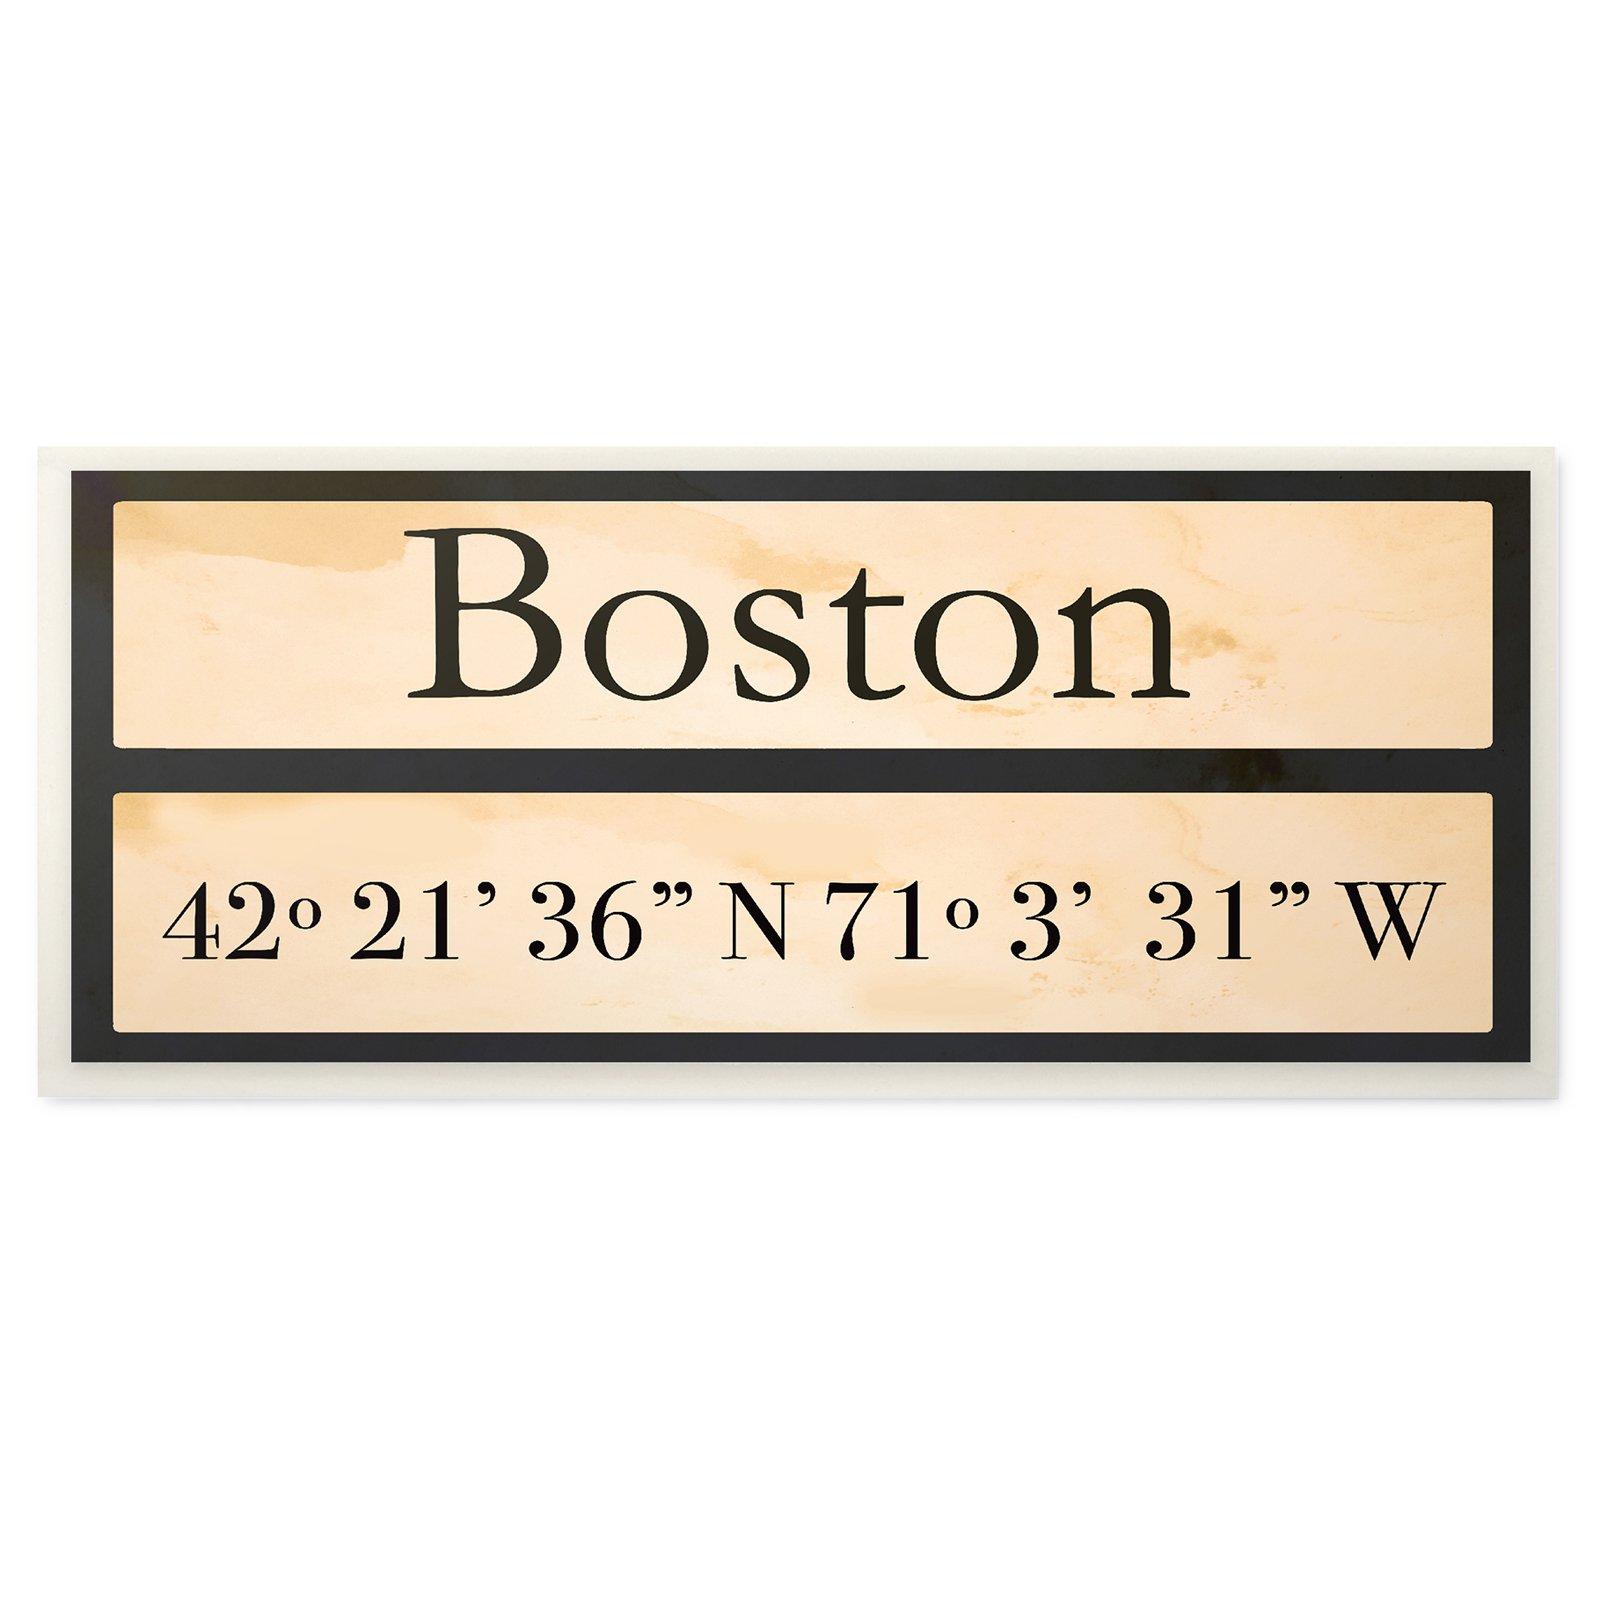 Home Decor Boston: The Stupell Home Decor Collection Boston City Coordinates